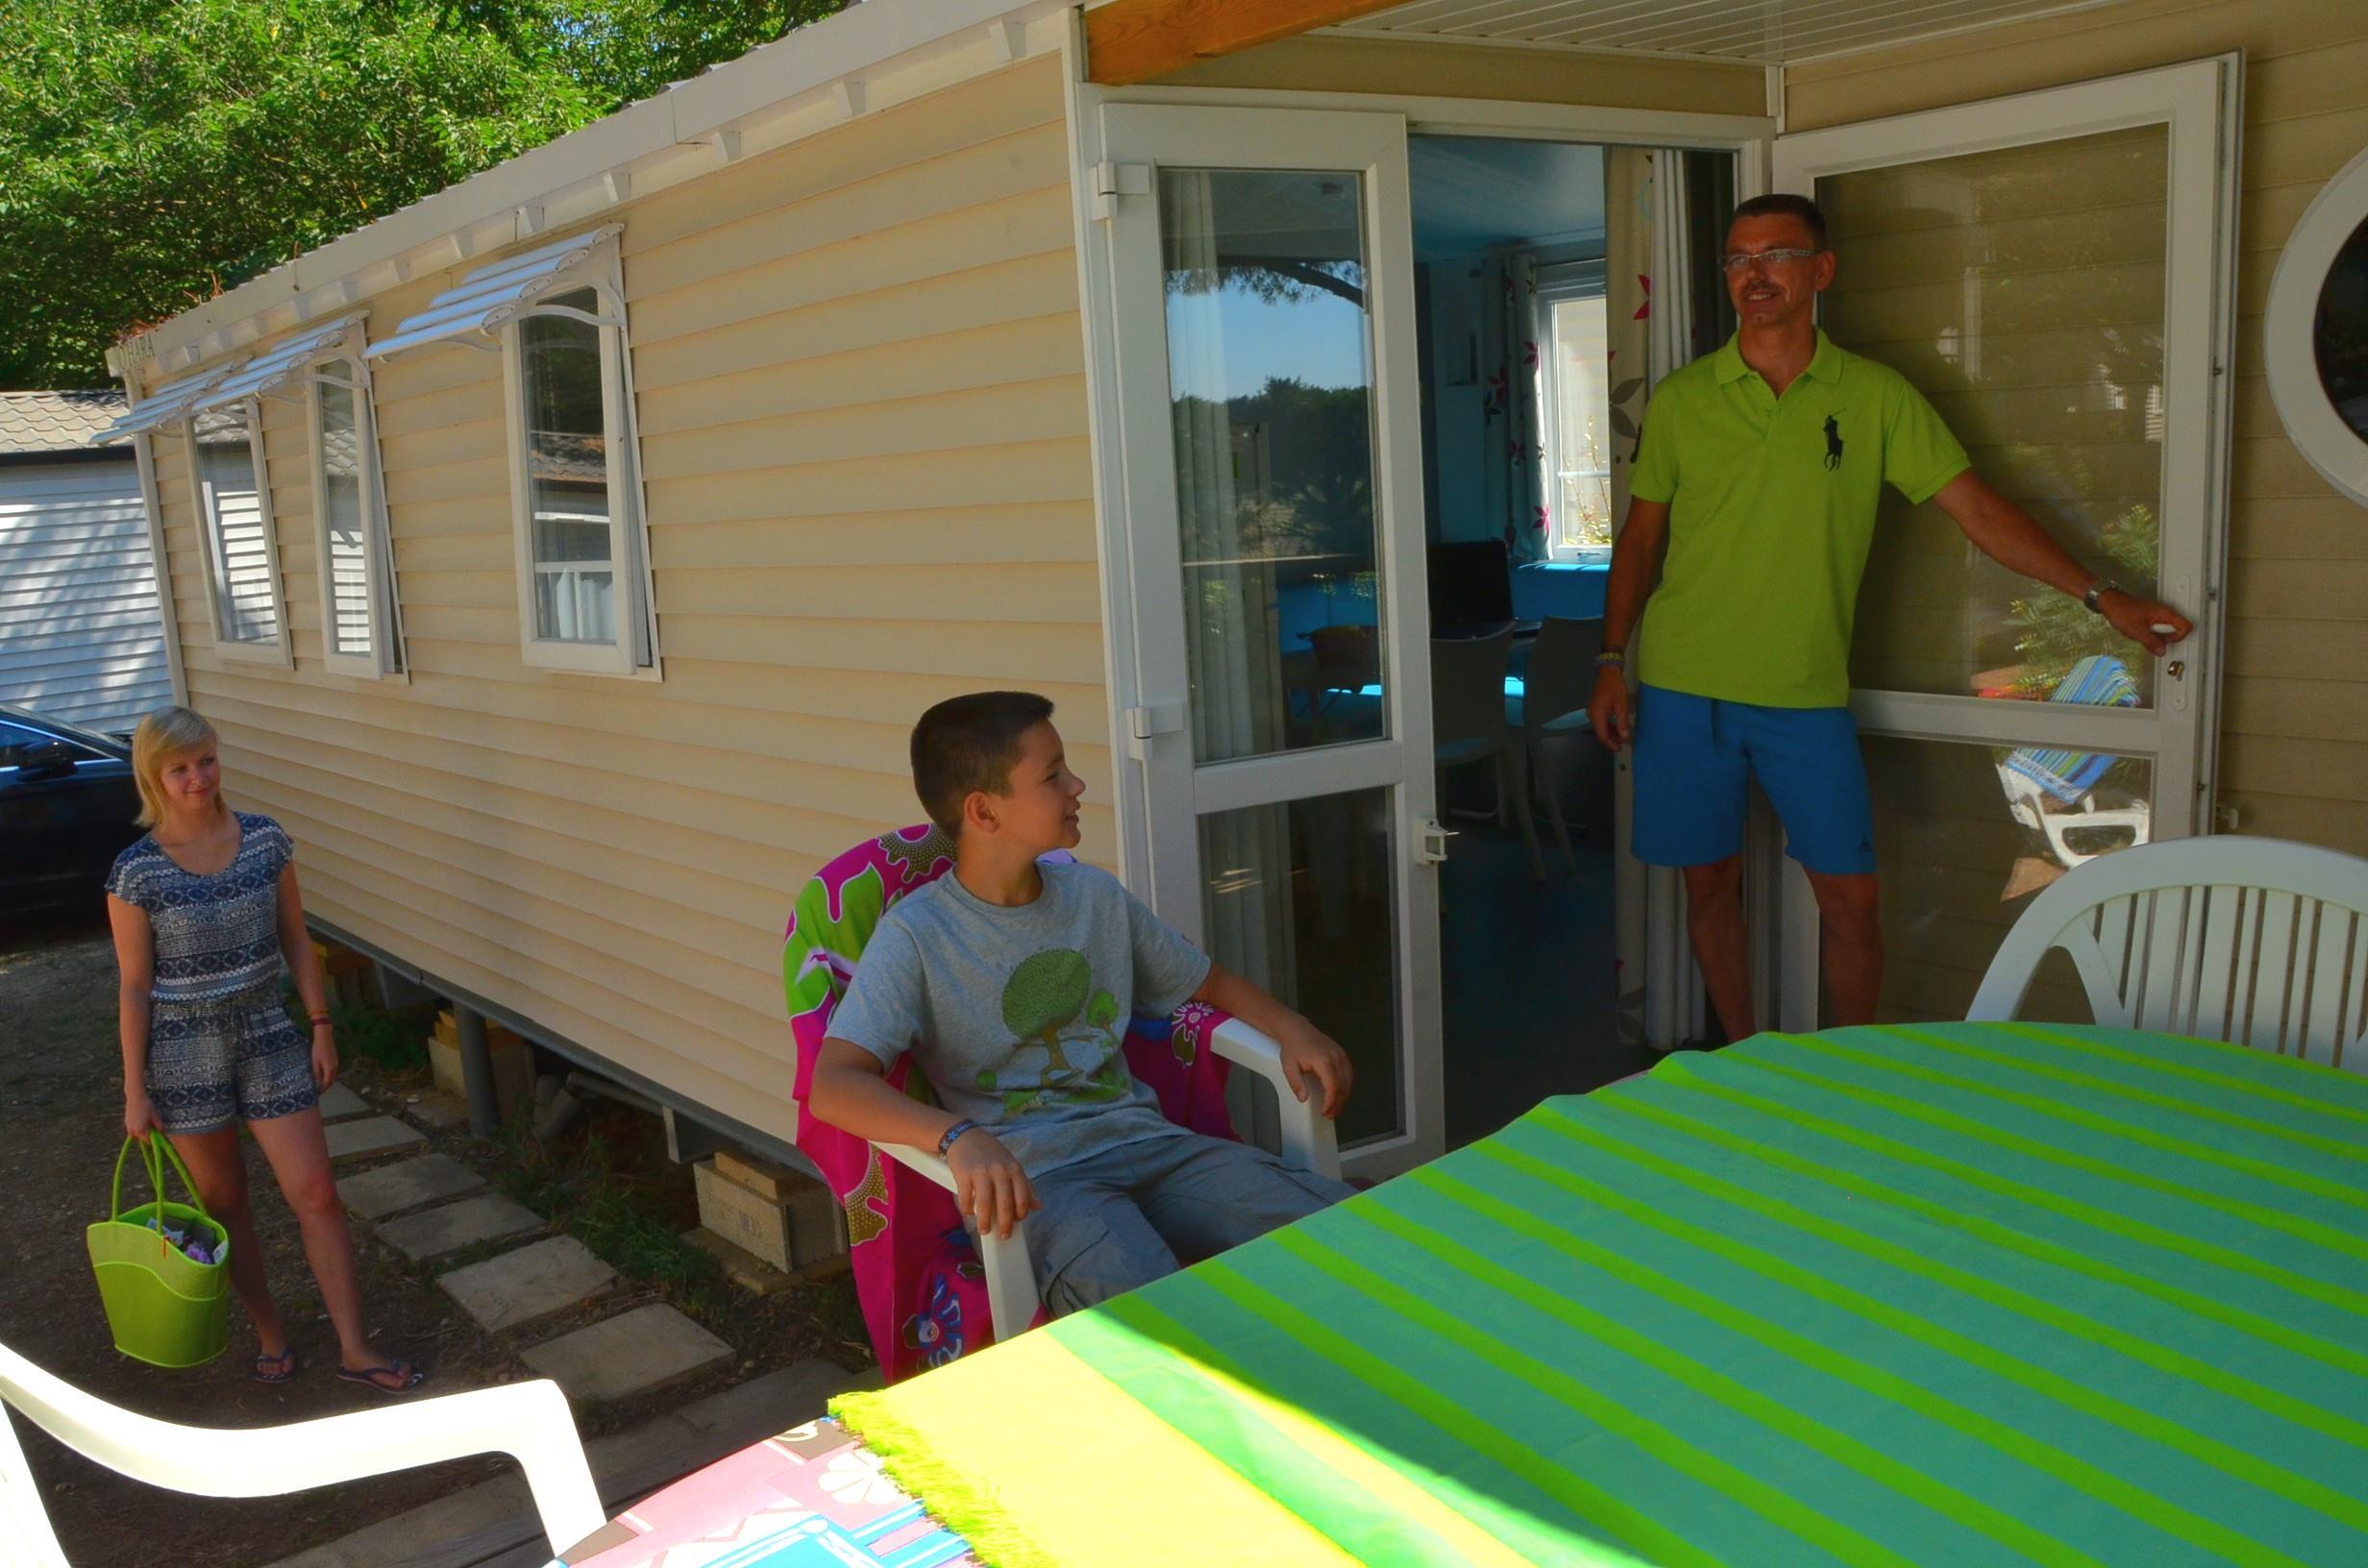 Location - Le Lodge Climatise 3 Chambres - Camping Le Bon Port